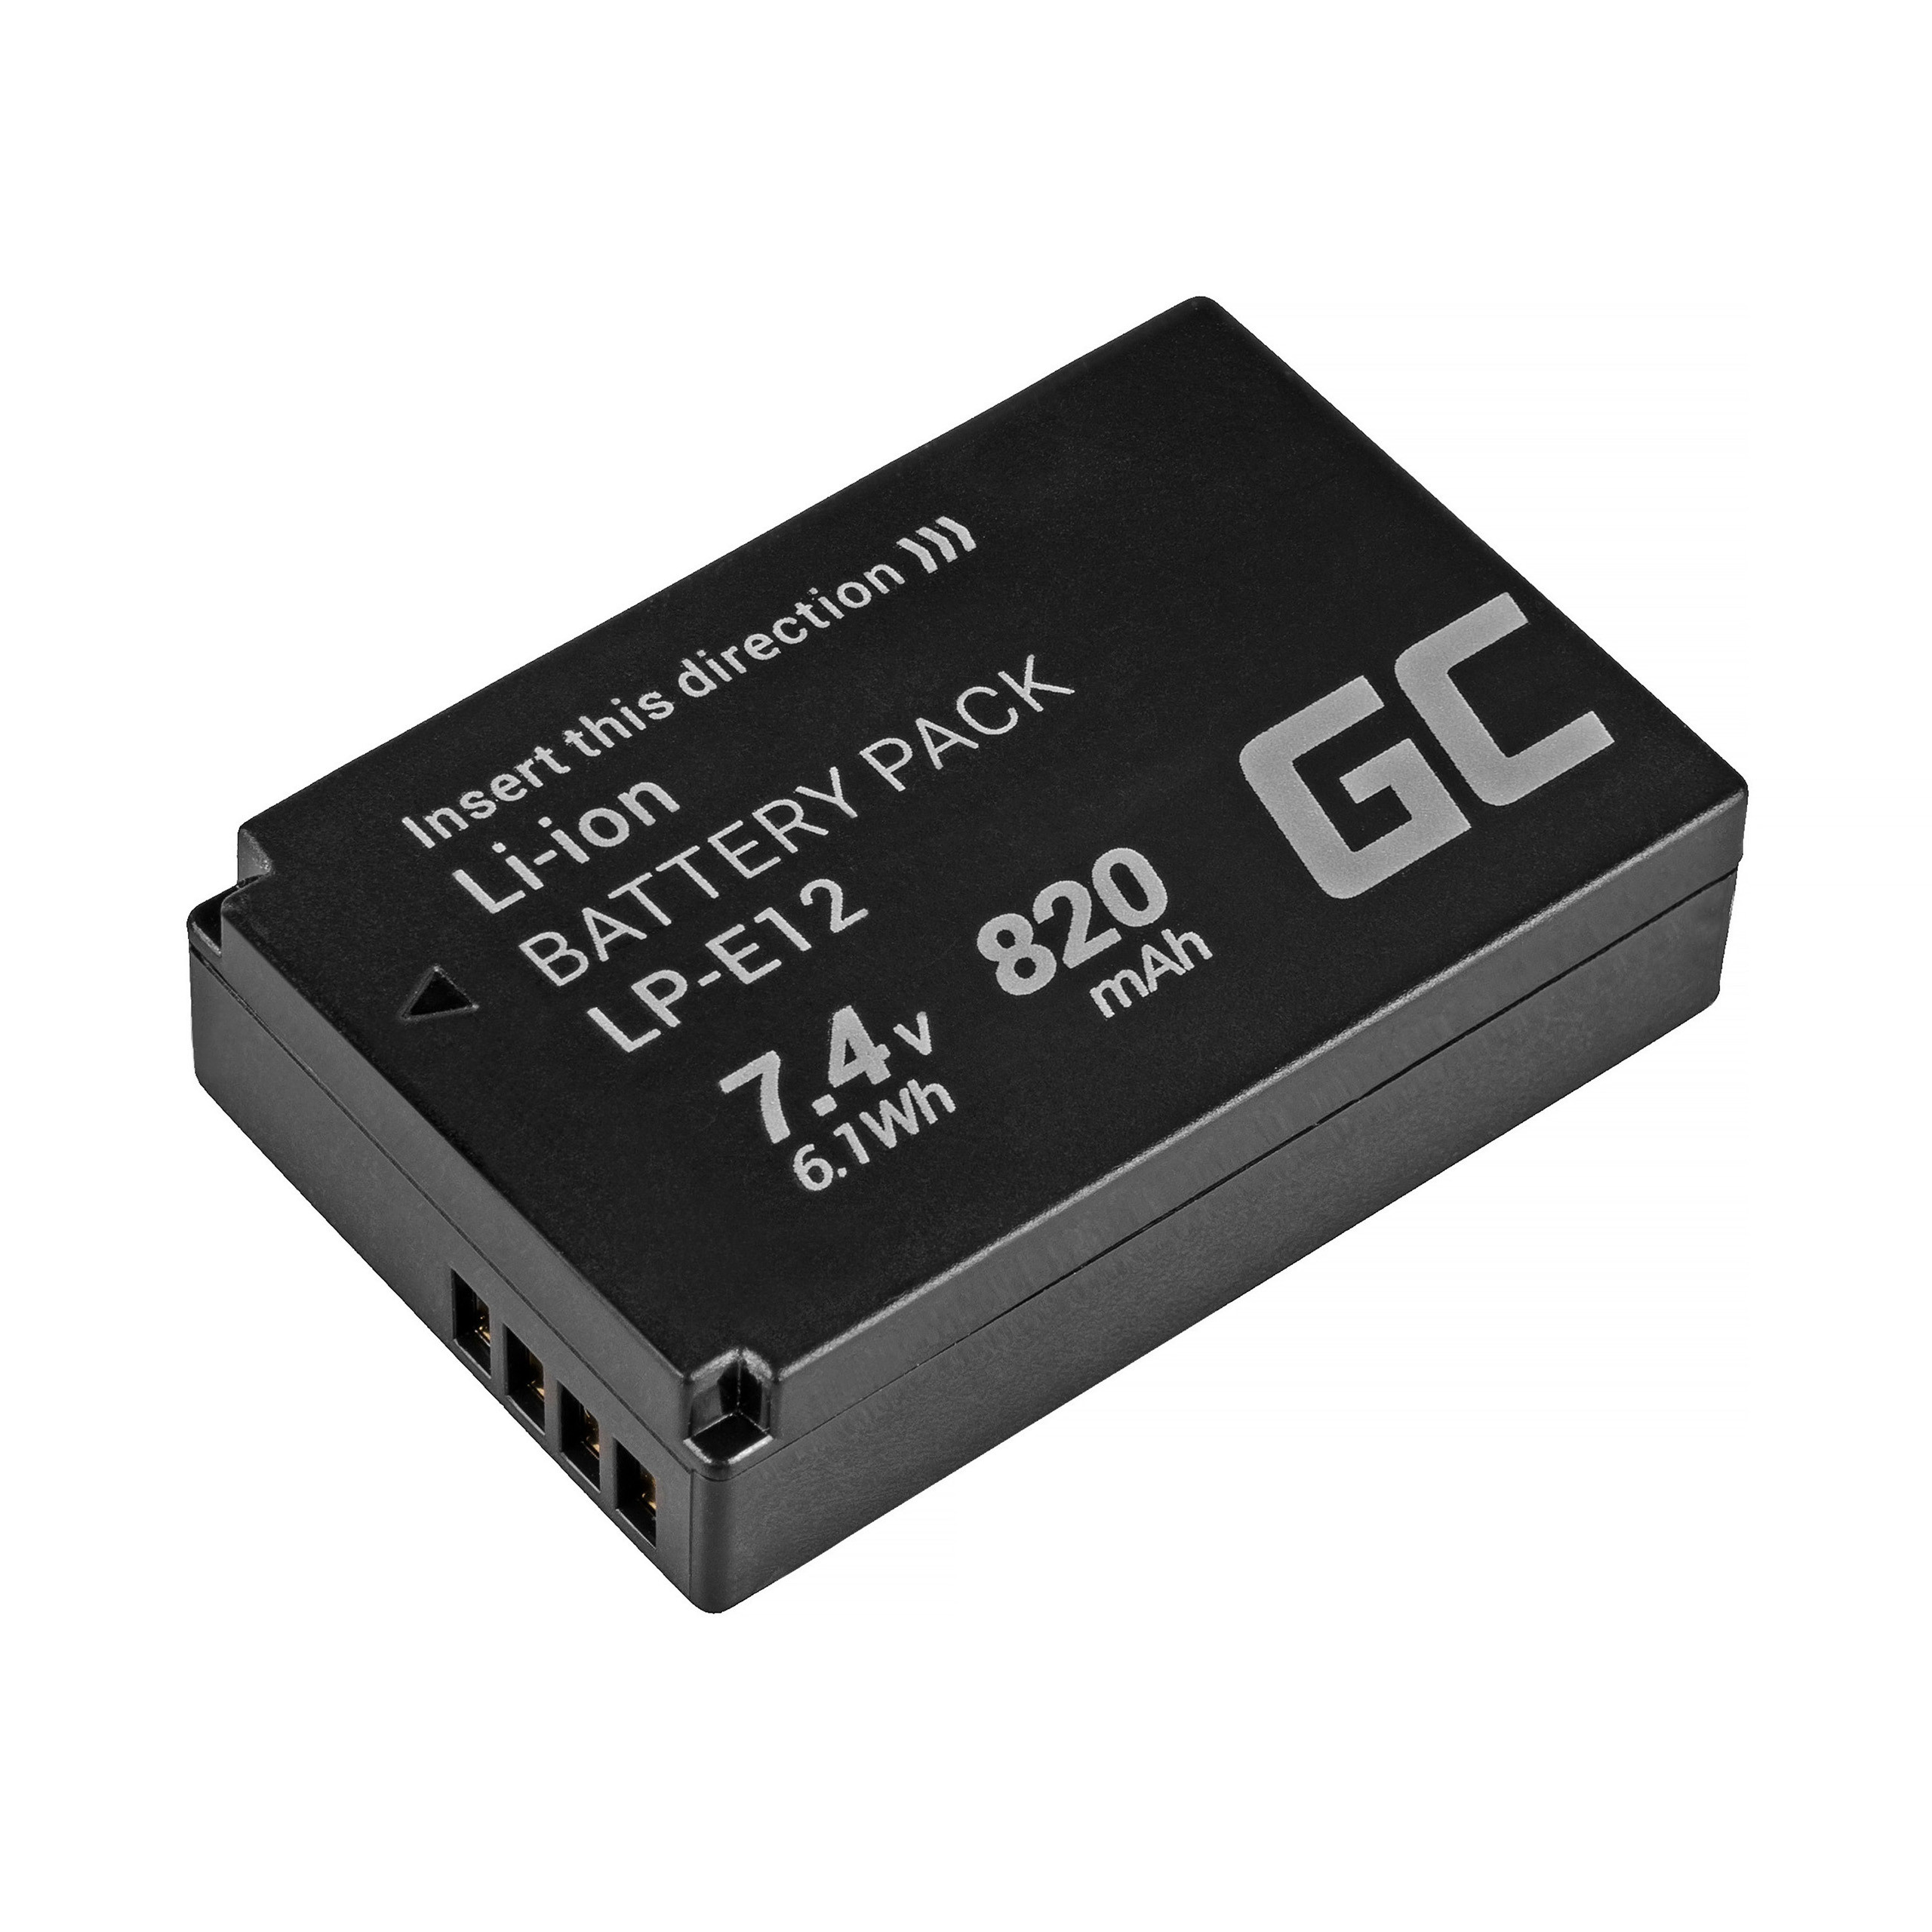 Green Cell LP-E12 Camera Battery for Canon EOS M100, EOS100D, EOS-M, EOS M2, EOS M10, Rebel SL1 7.4V 820mAh